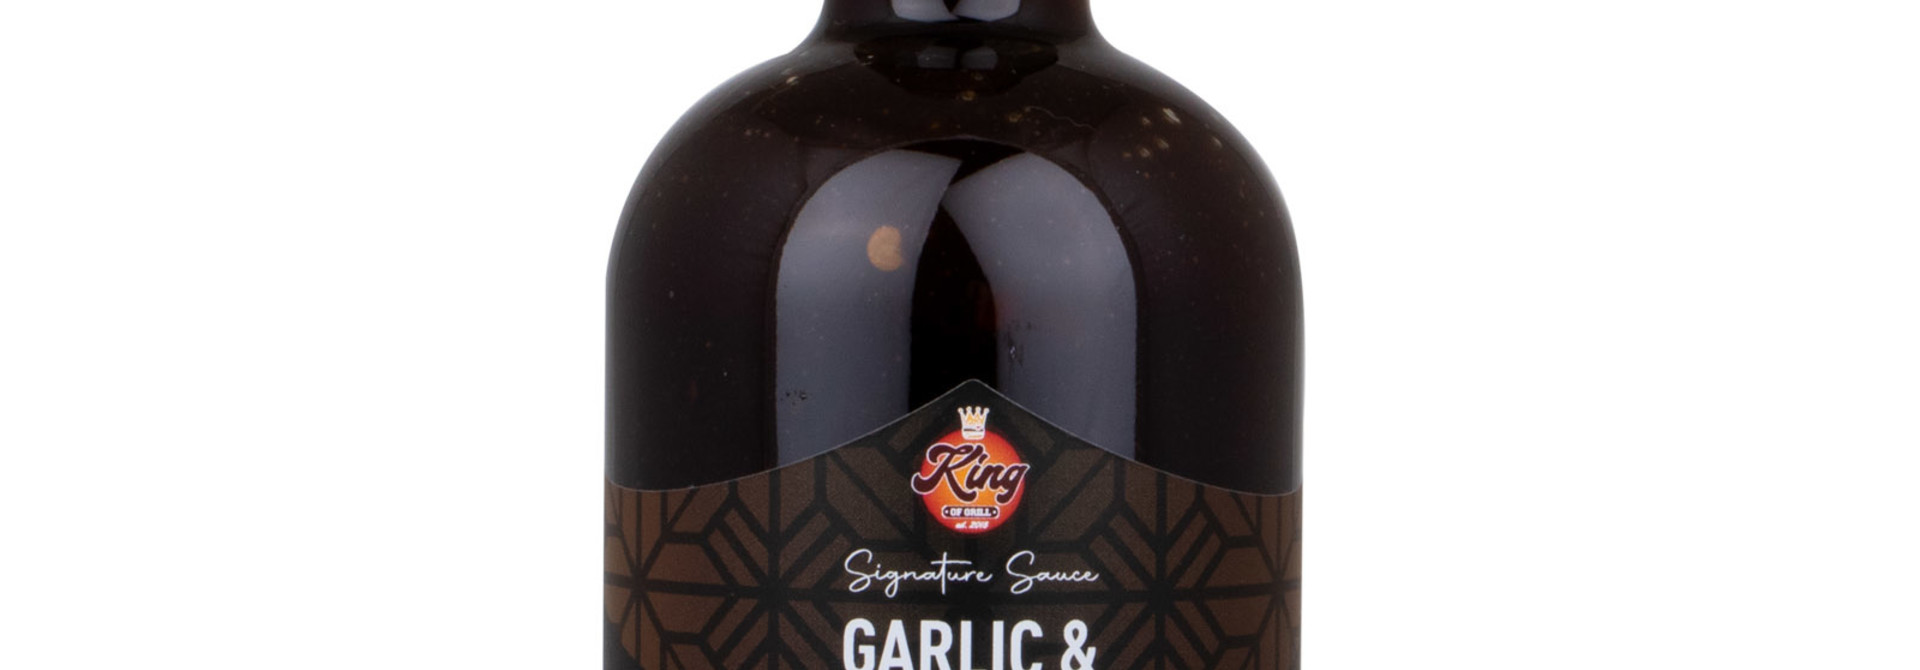 King Of Grill's Garlic & Coffee BBQ Sauce